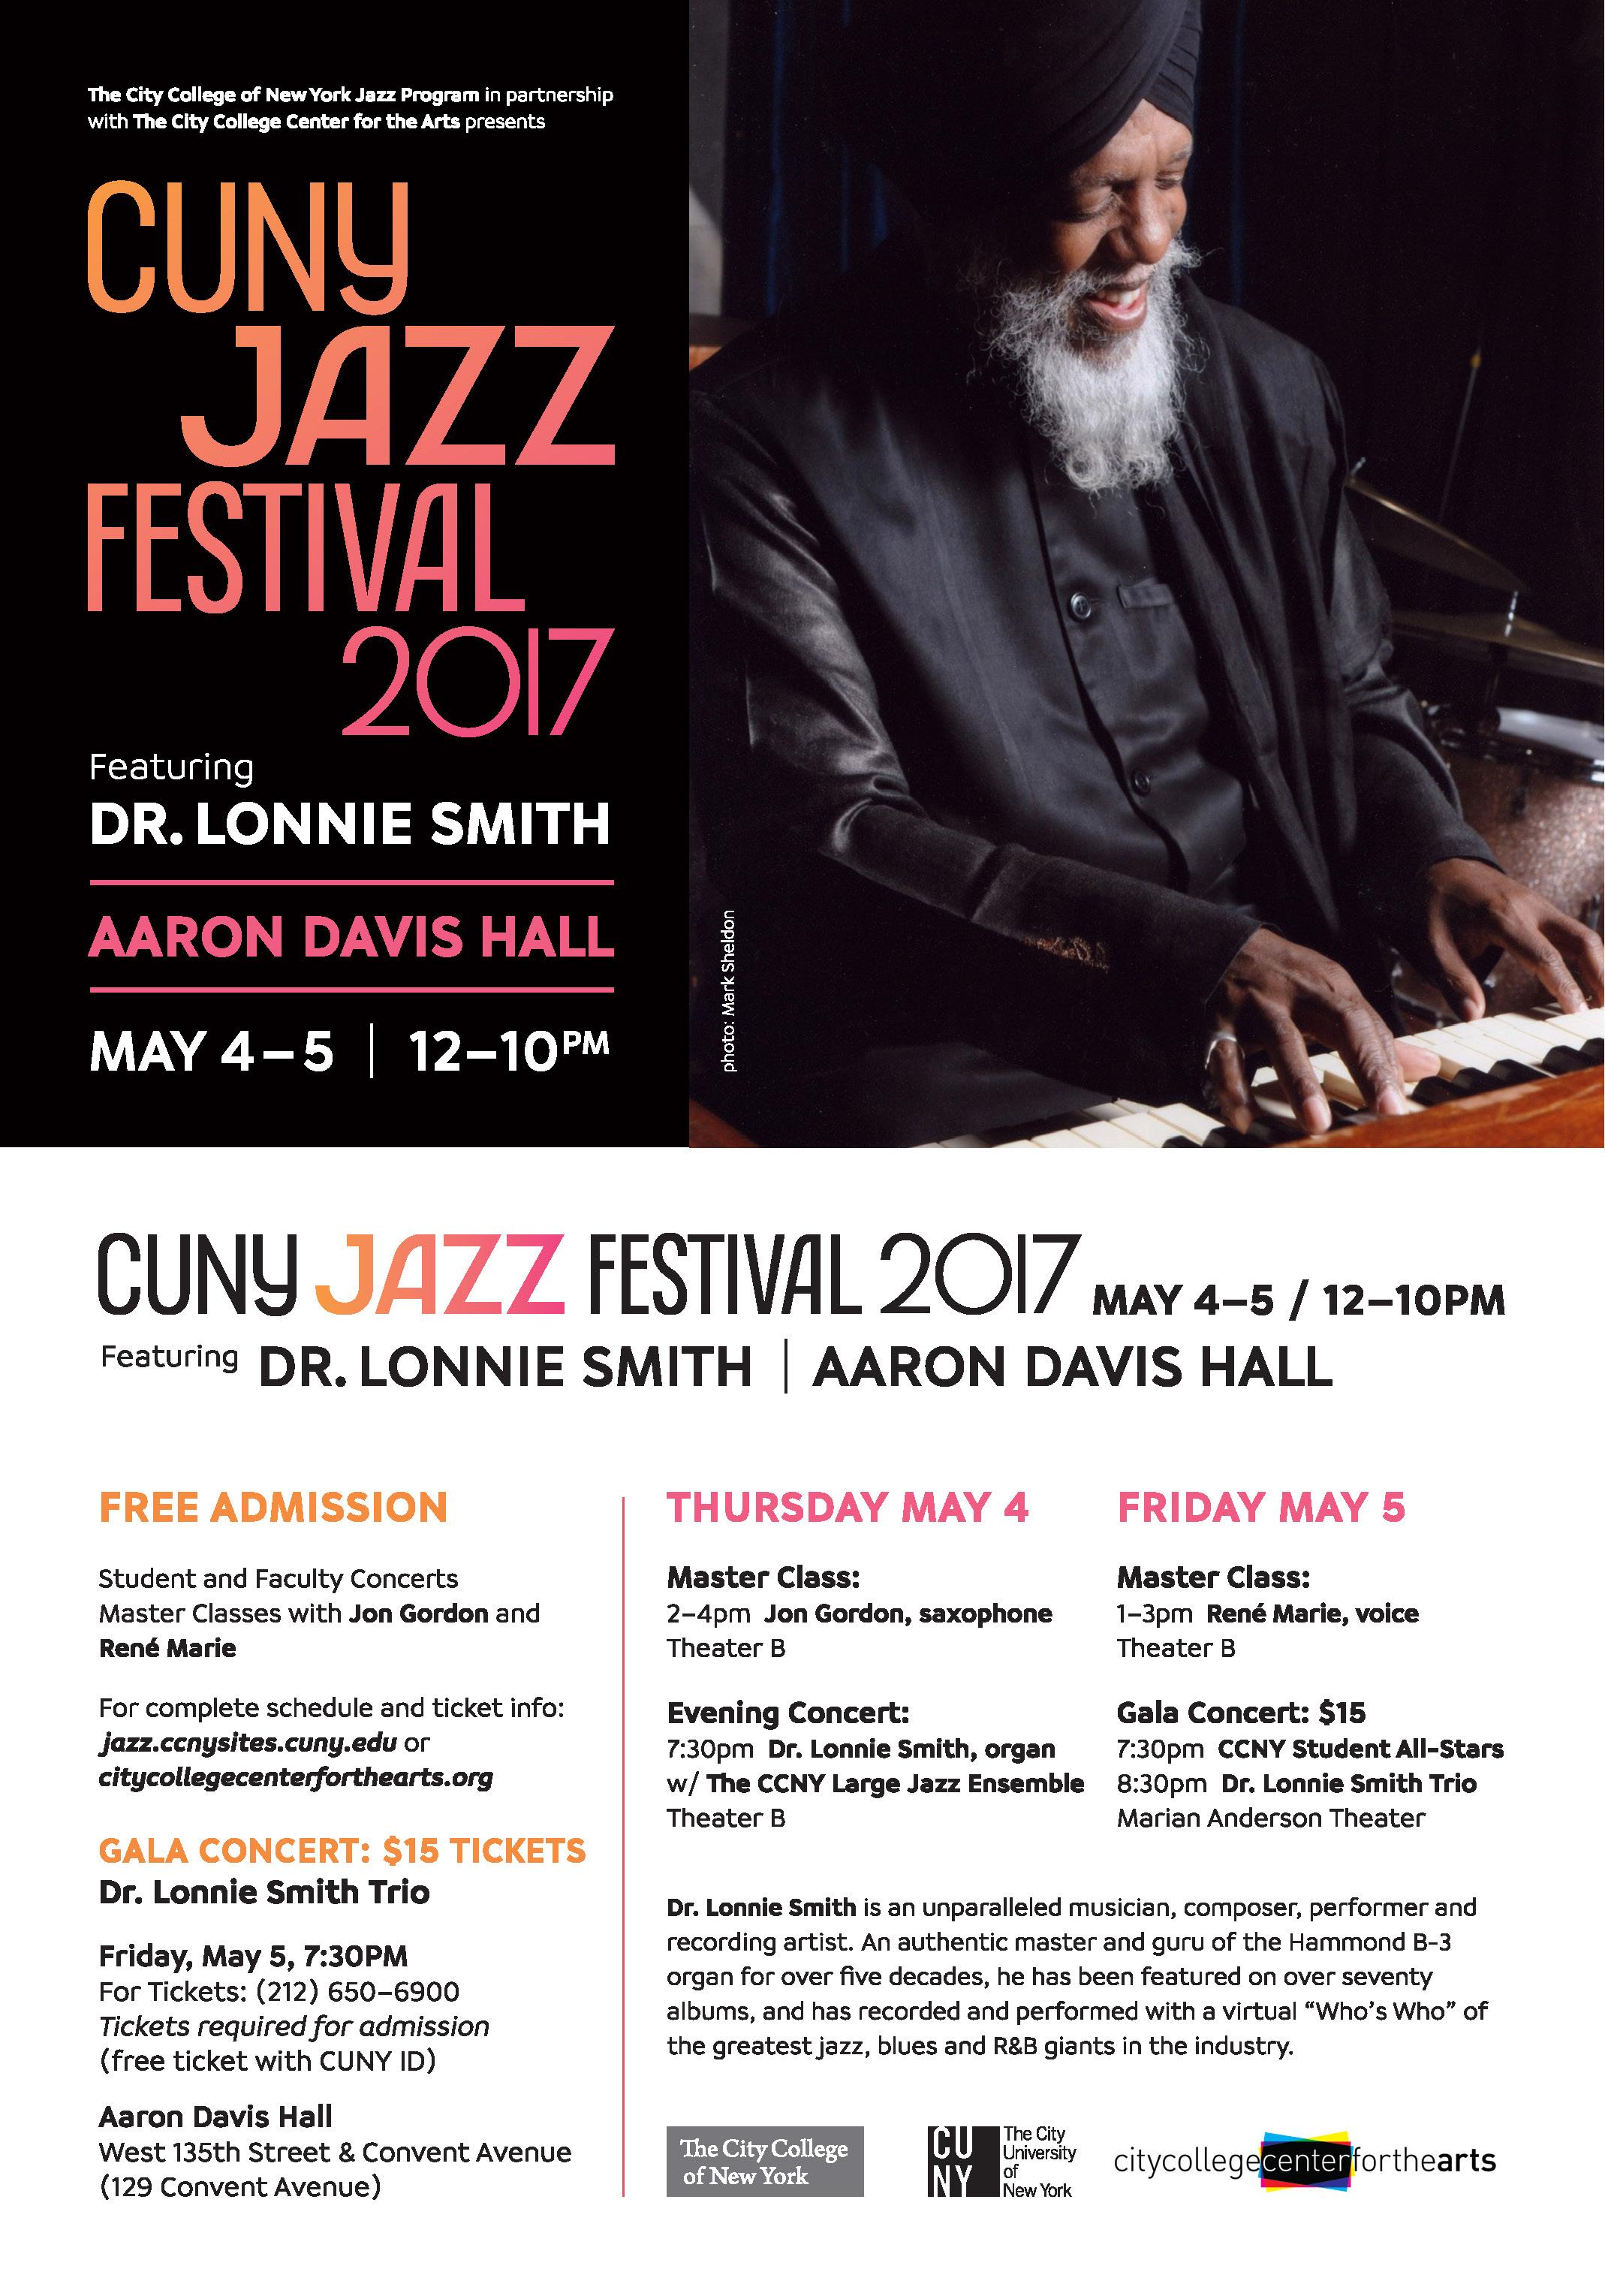 CUNY Jazz Festival 2017